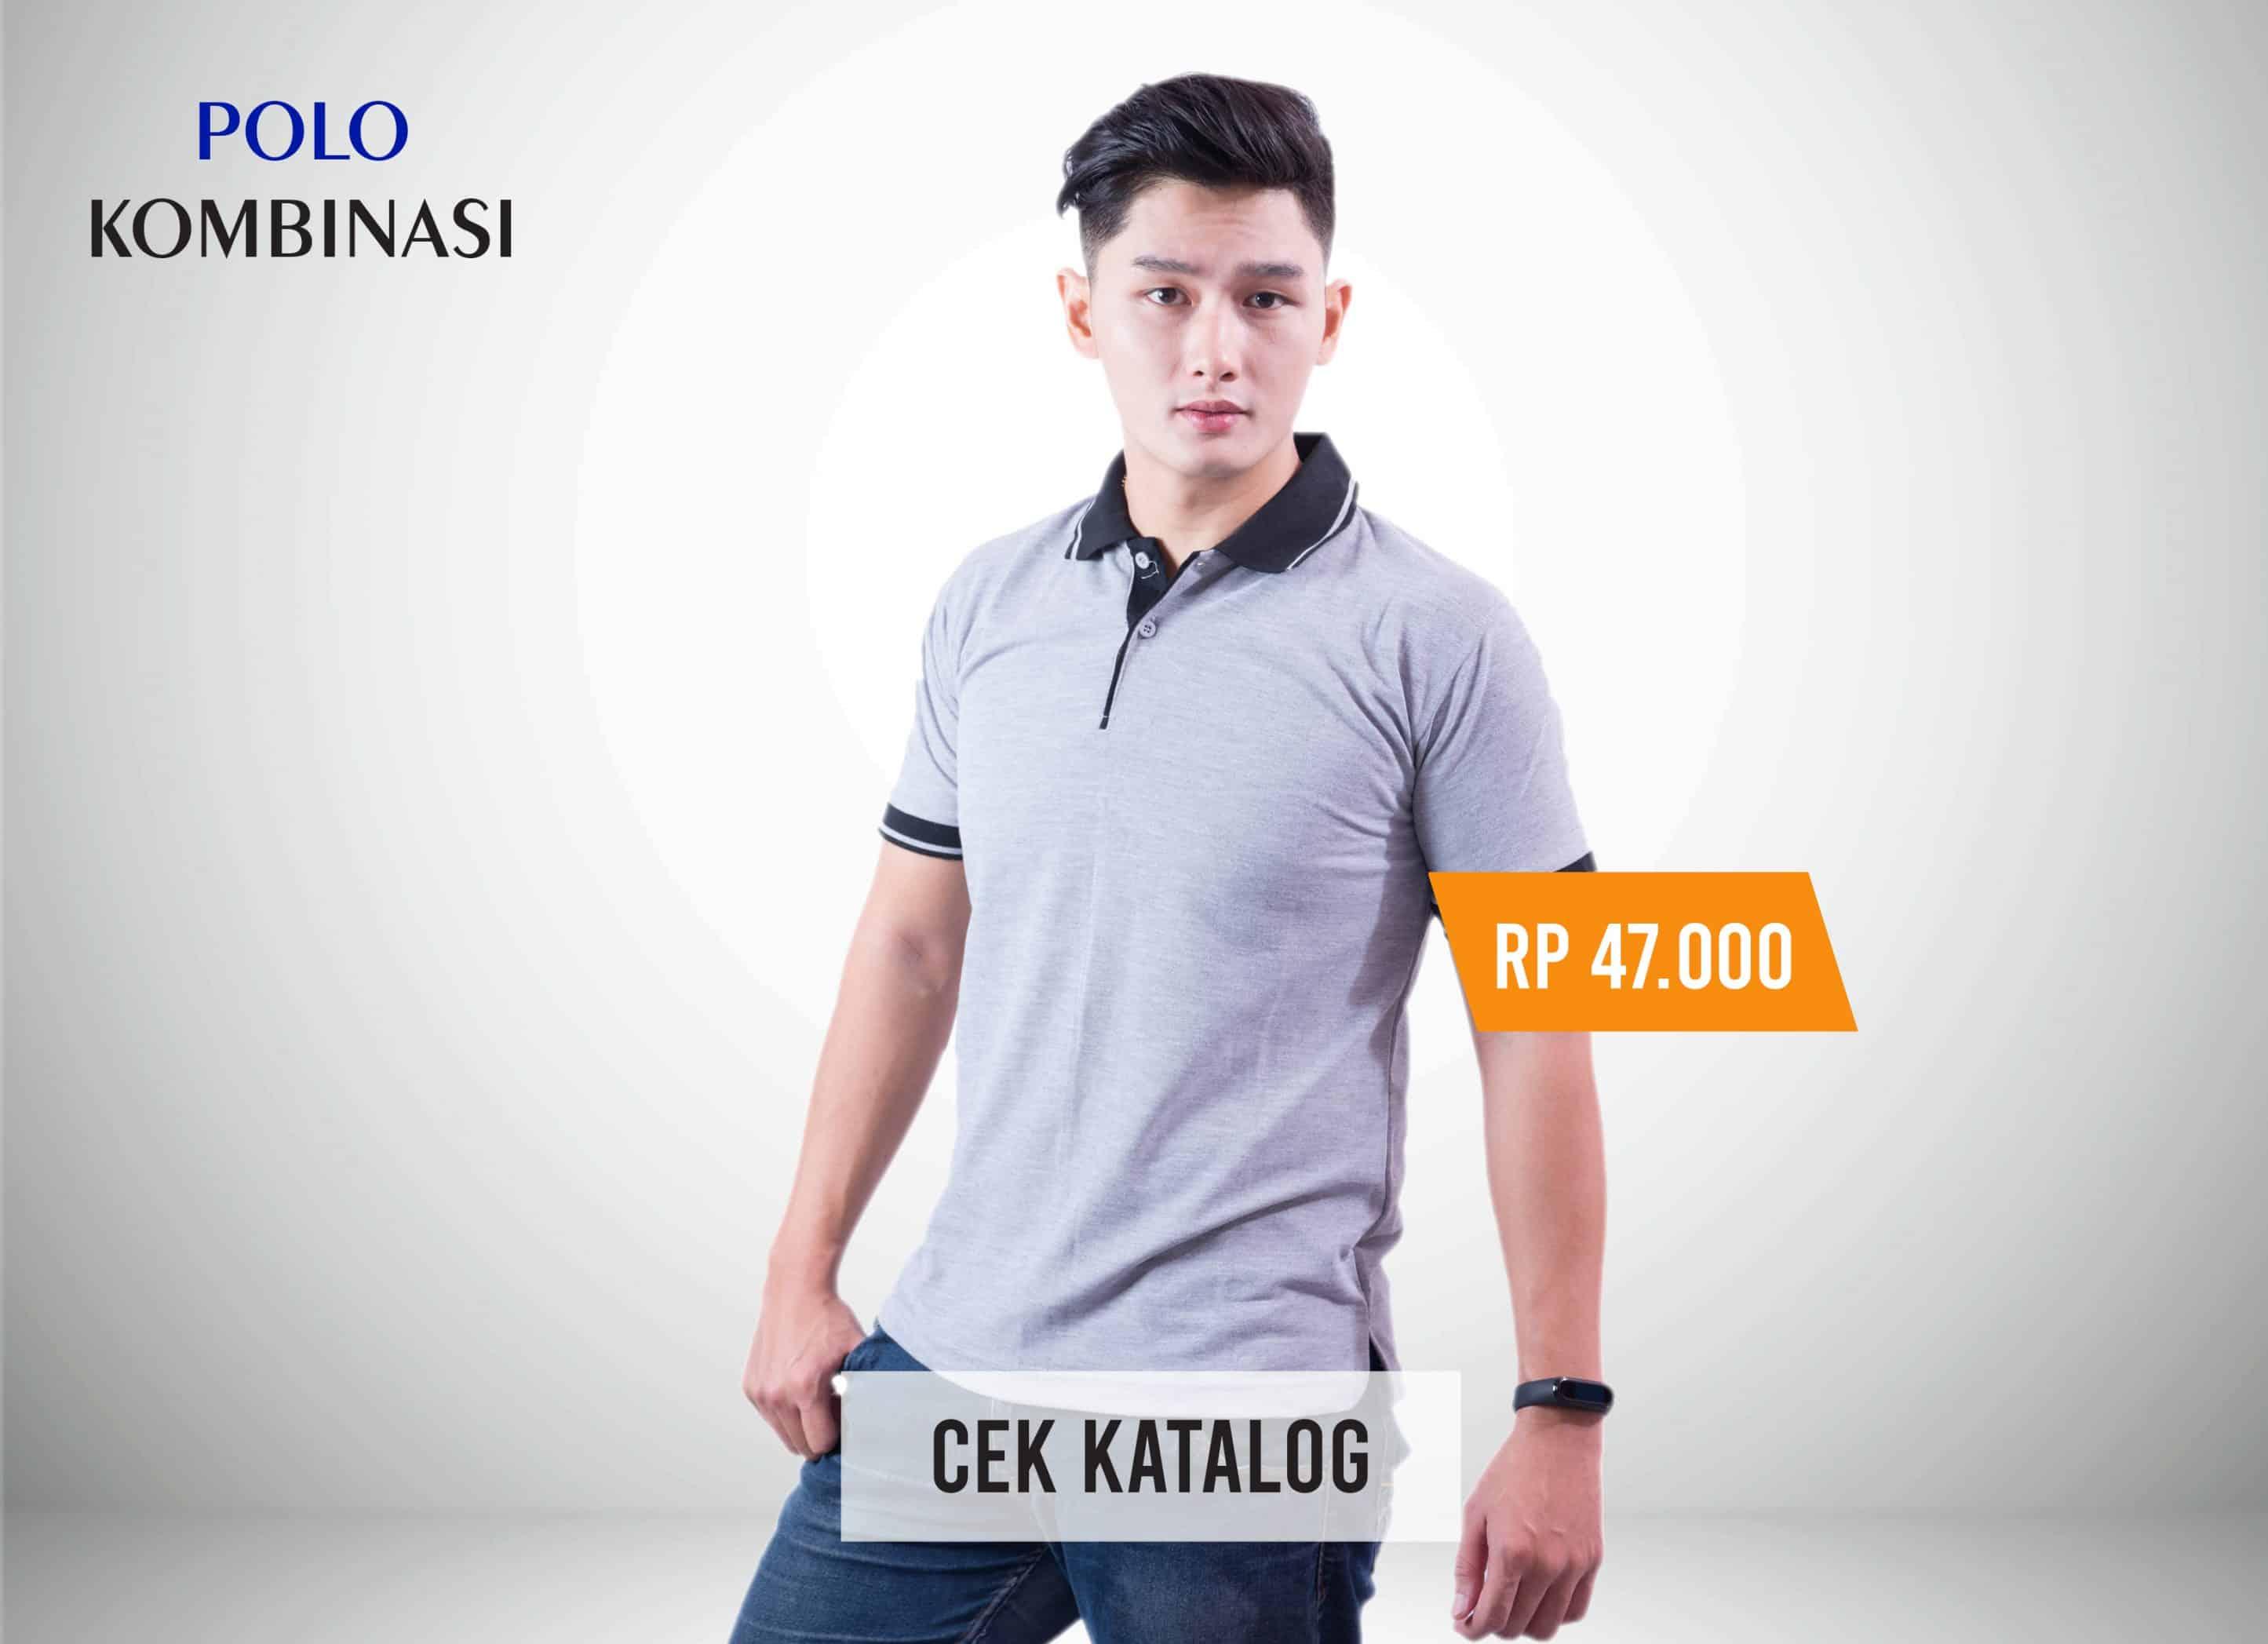 Kaos Polo Jogja Murah - Grosir Polo Jogja - KMB - Ozzy Clothing